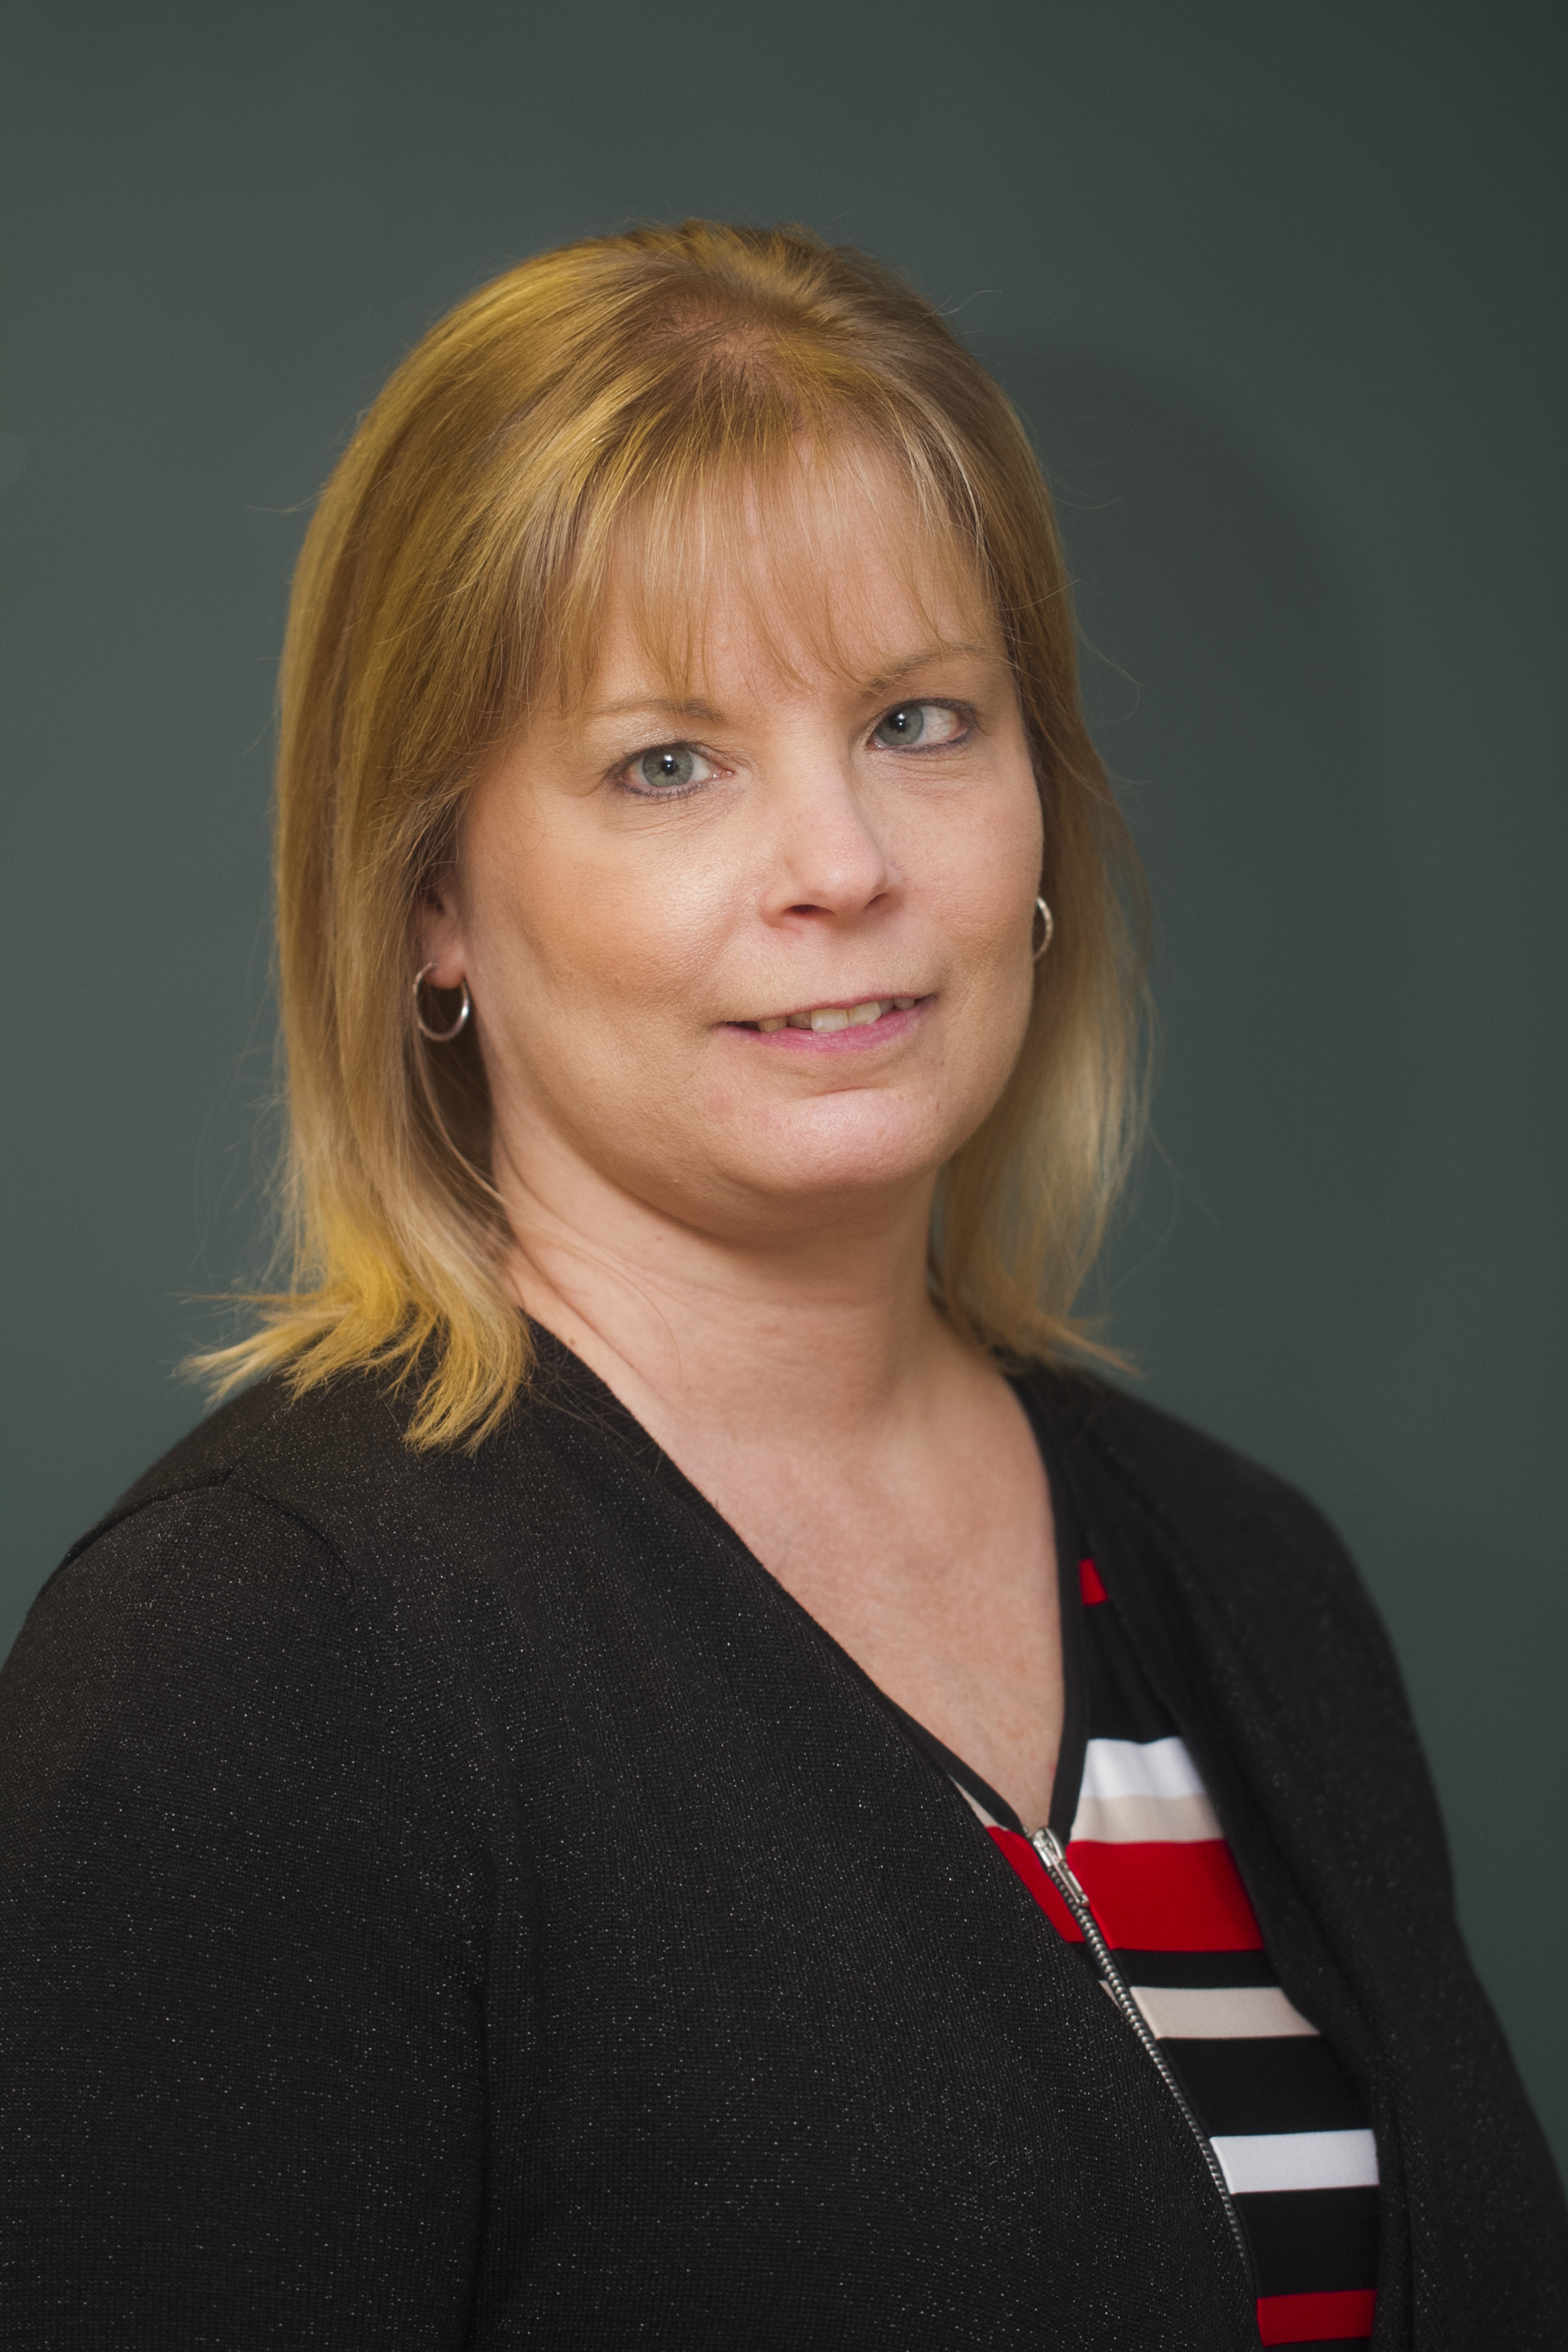 Michelle Nelson, LIMHP, LADC, PC